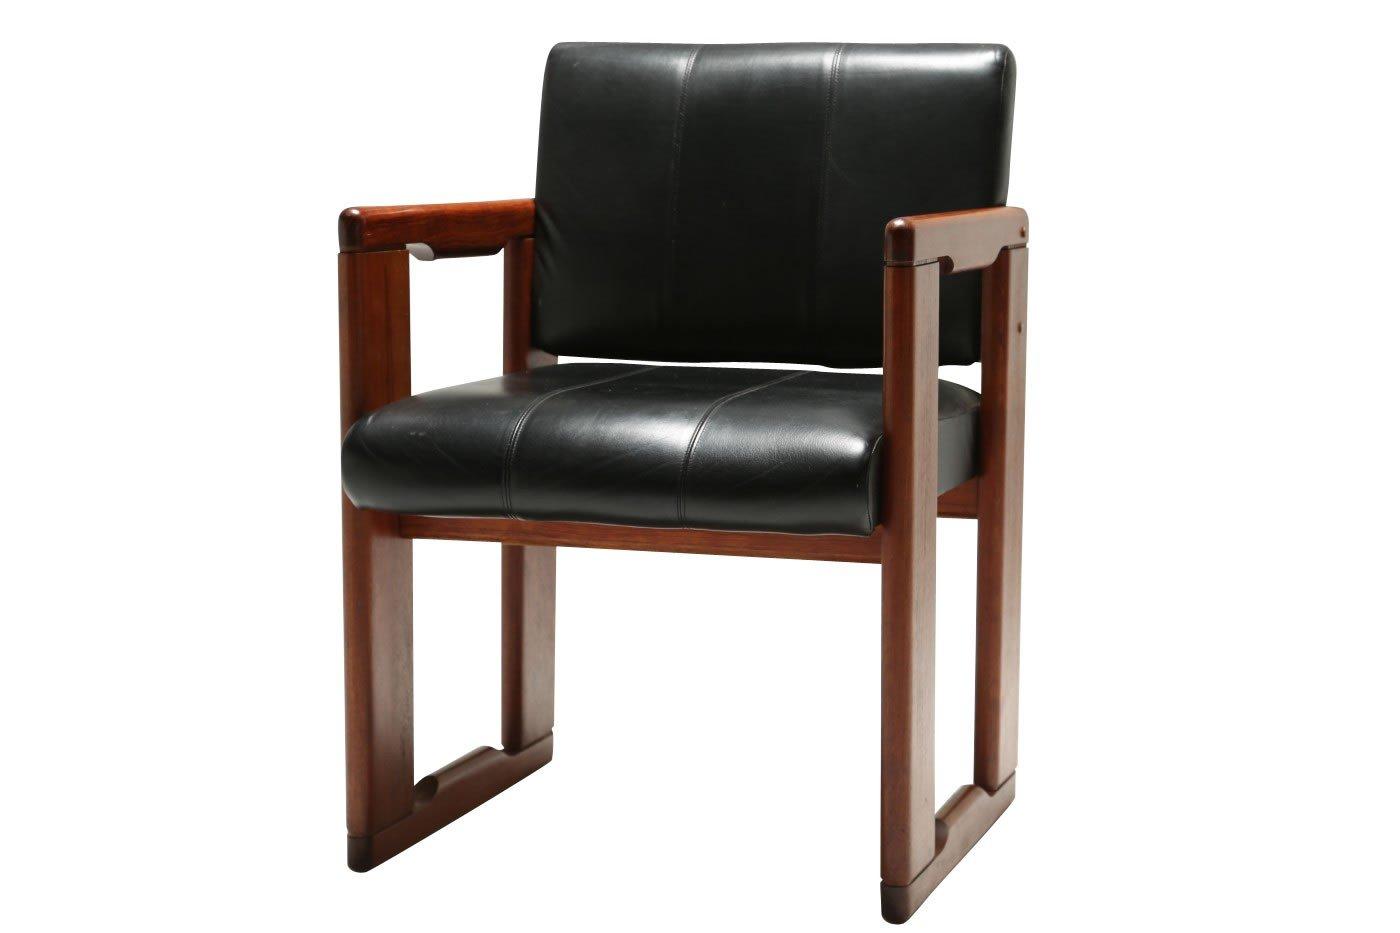 vintage leder stuhl von tobia scarpa bei pamono kaufen. Black Bedroom Furniture Sets. Home Design Ideas